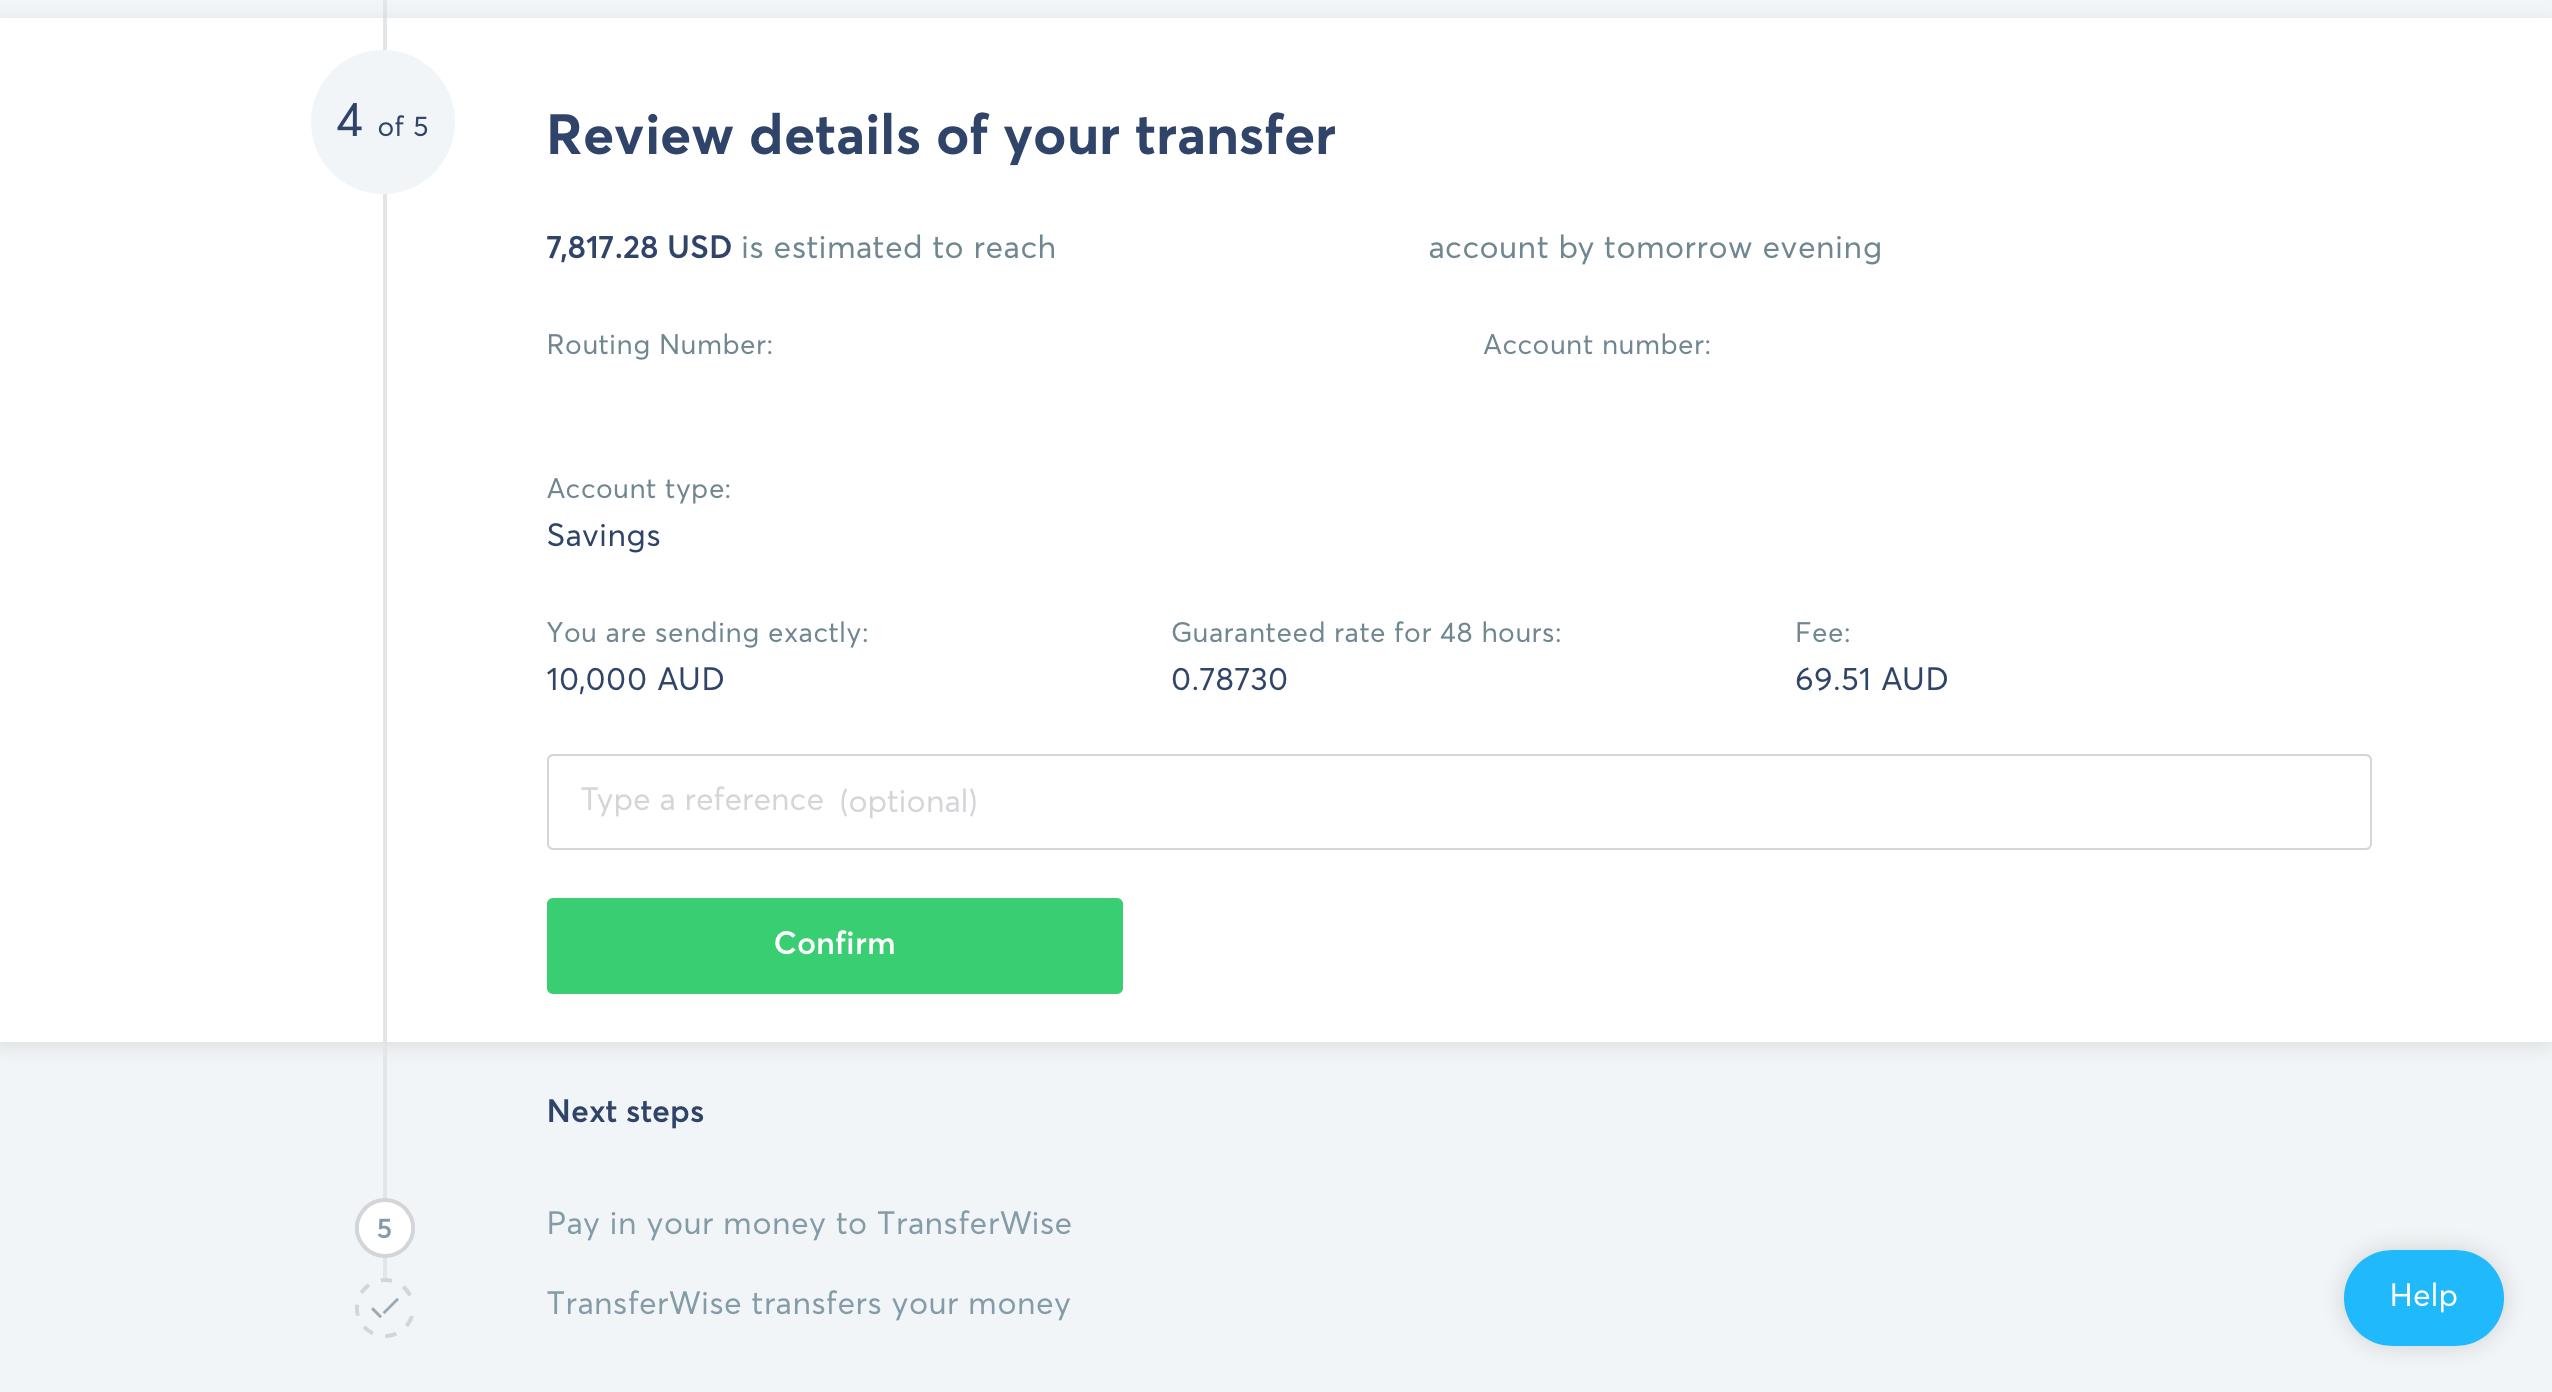 Screenshot of review details when making money transfer